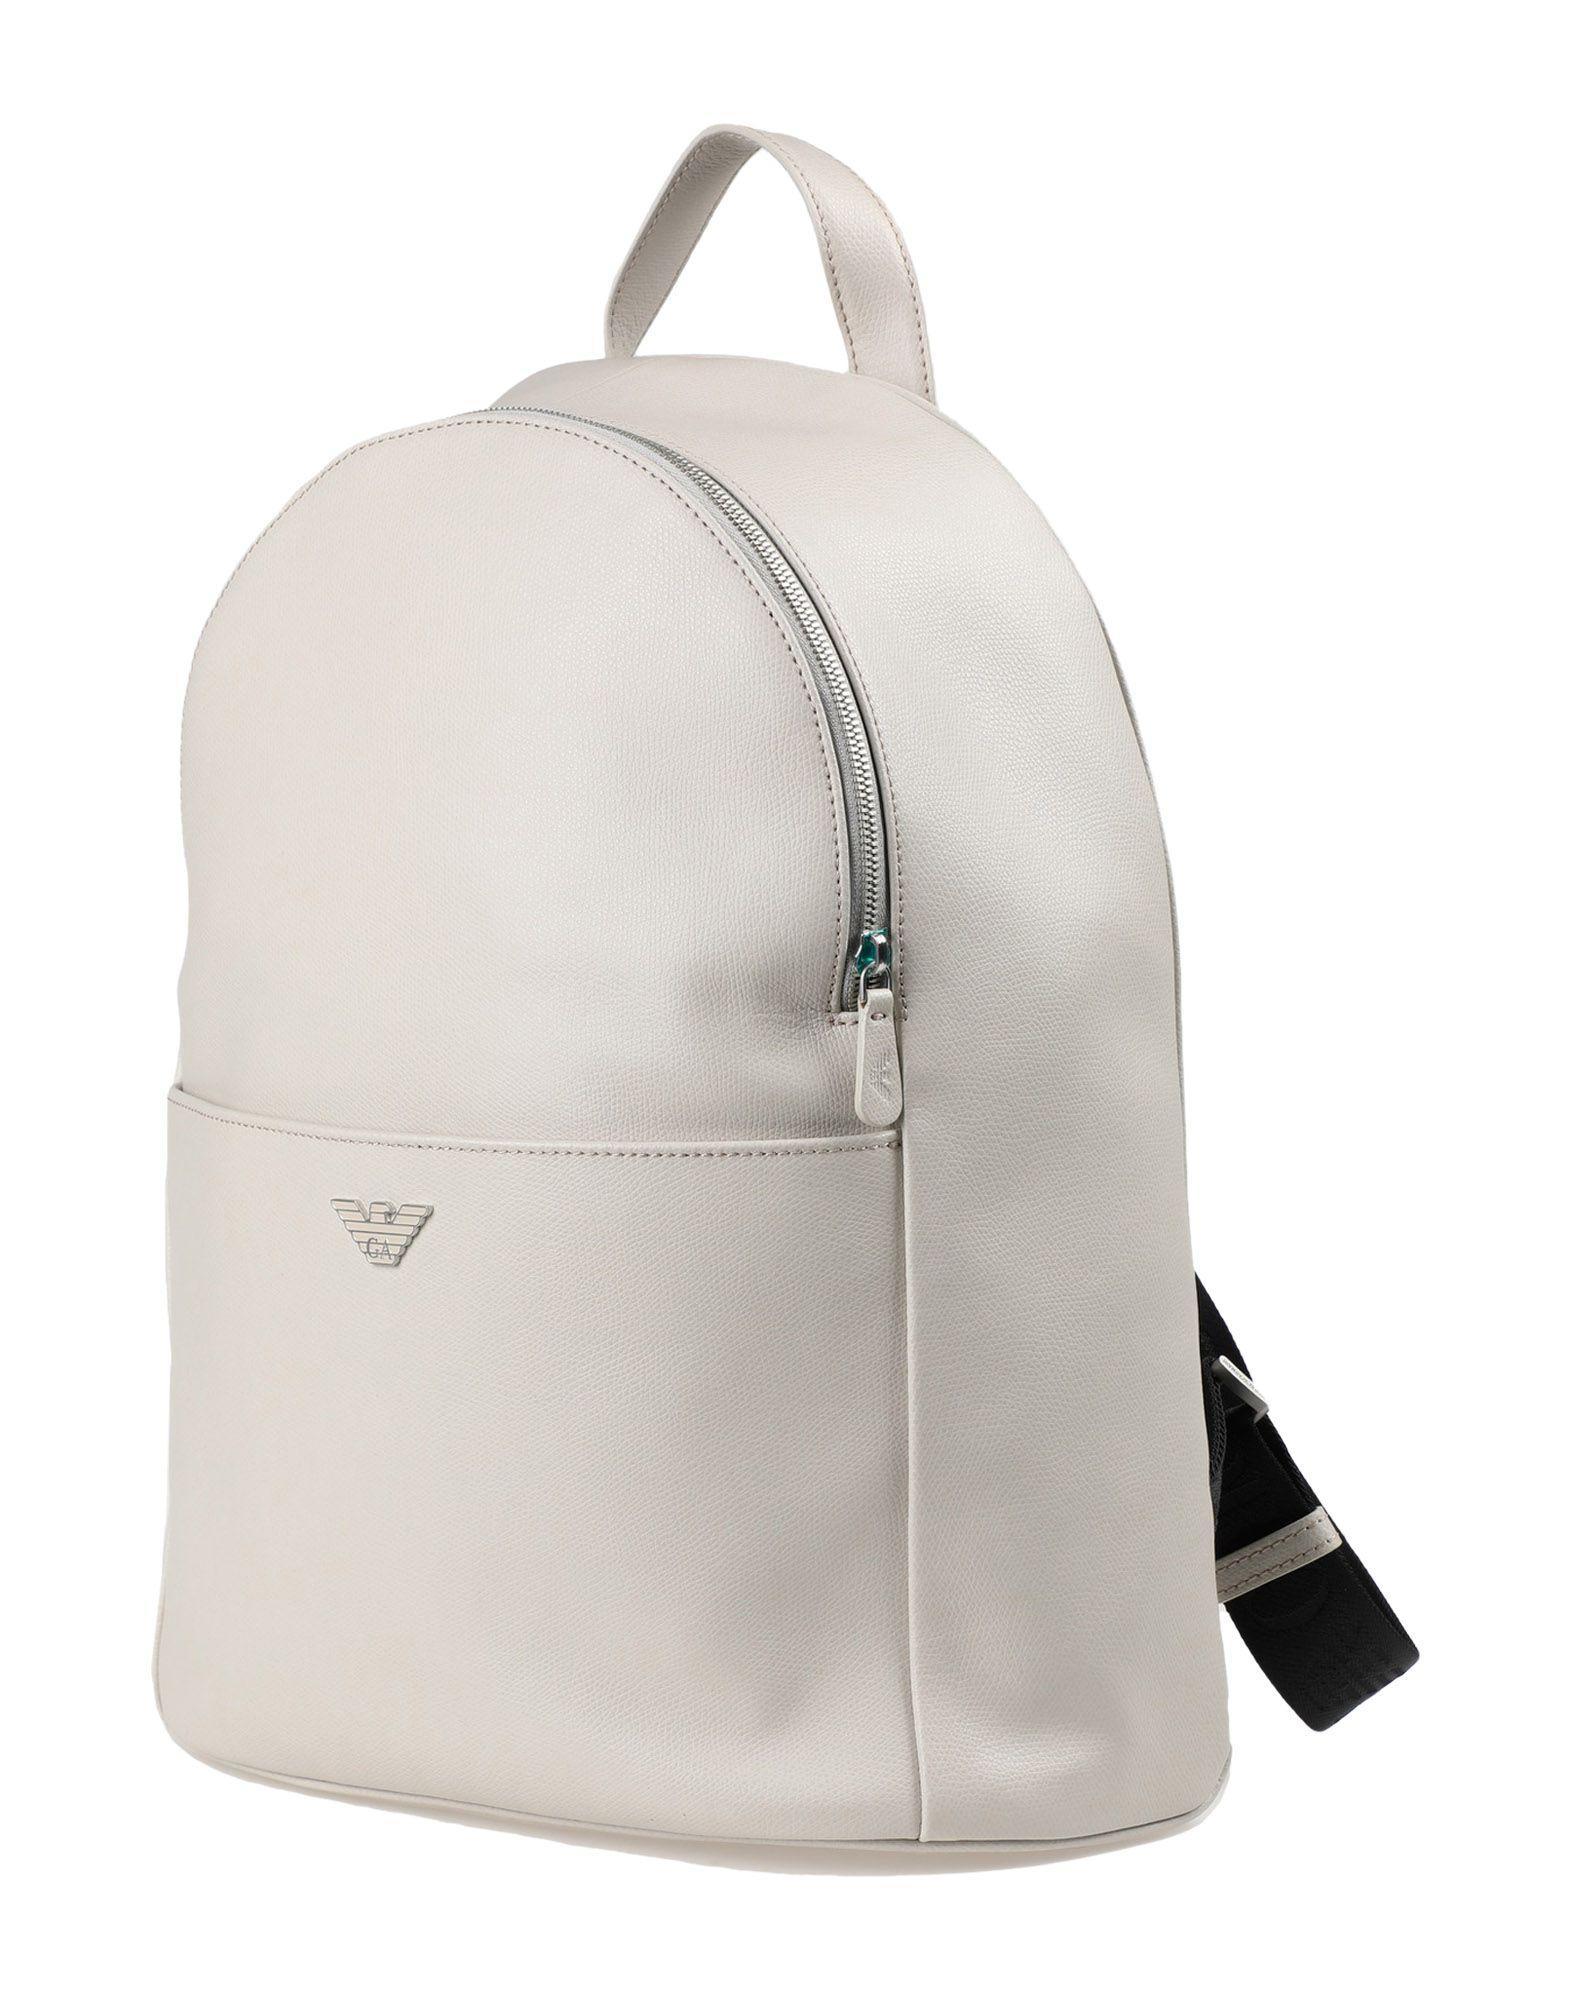 Emporio Armani Backpacks & Fanny Packs In Light Grey